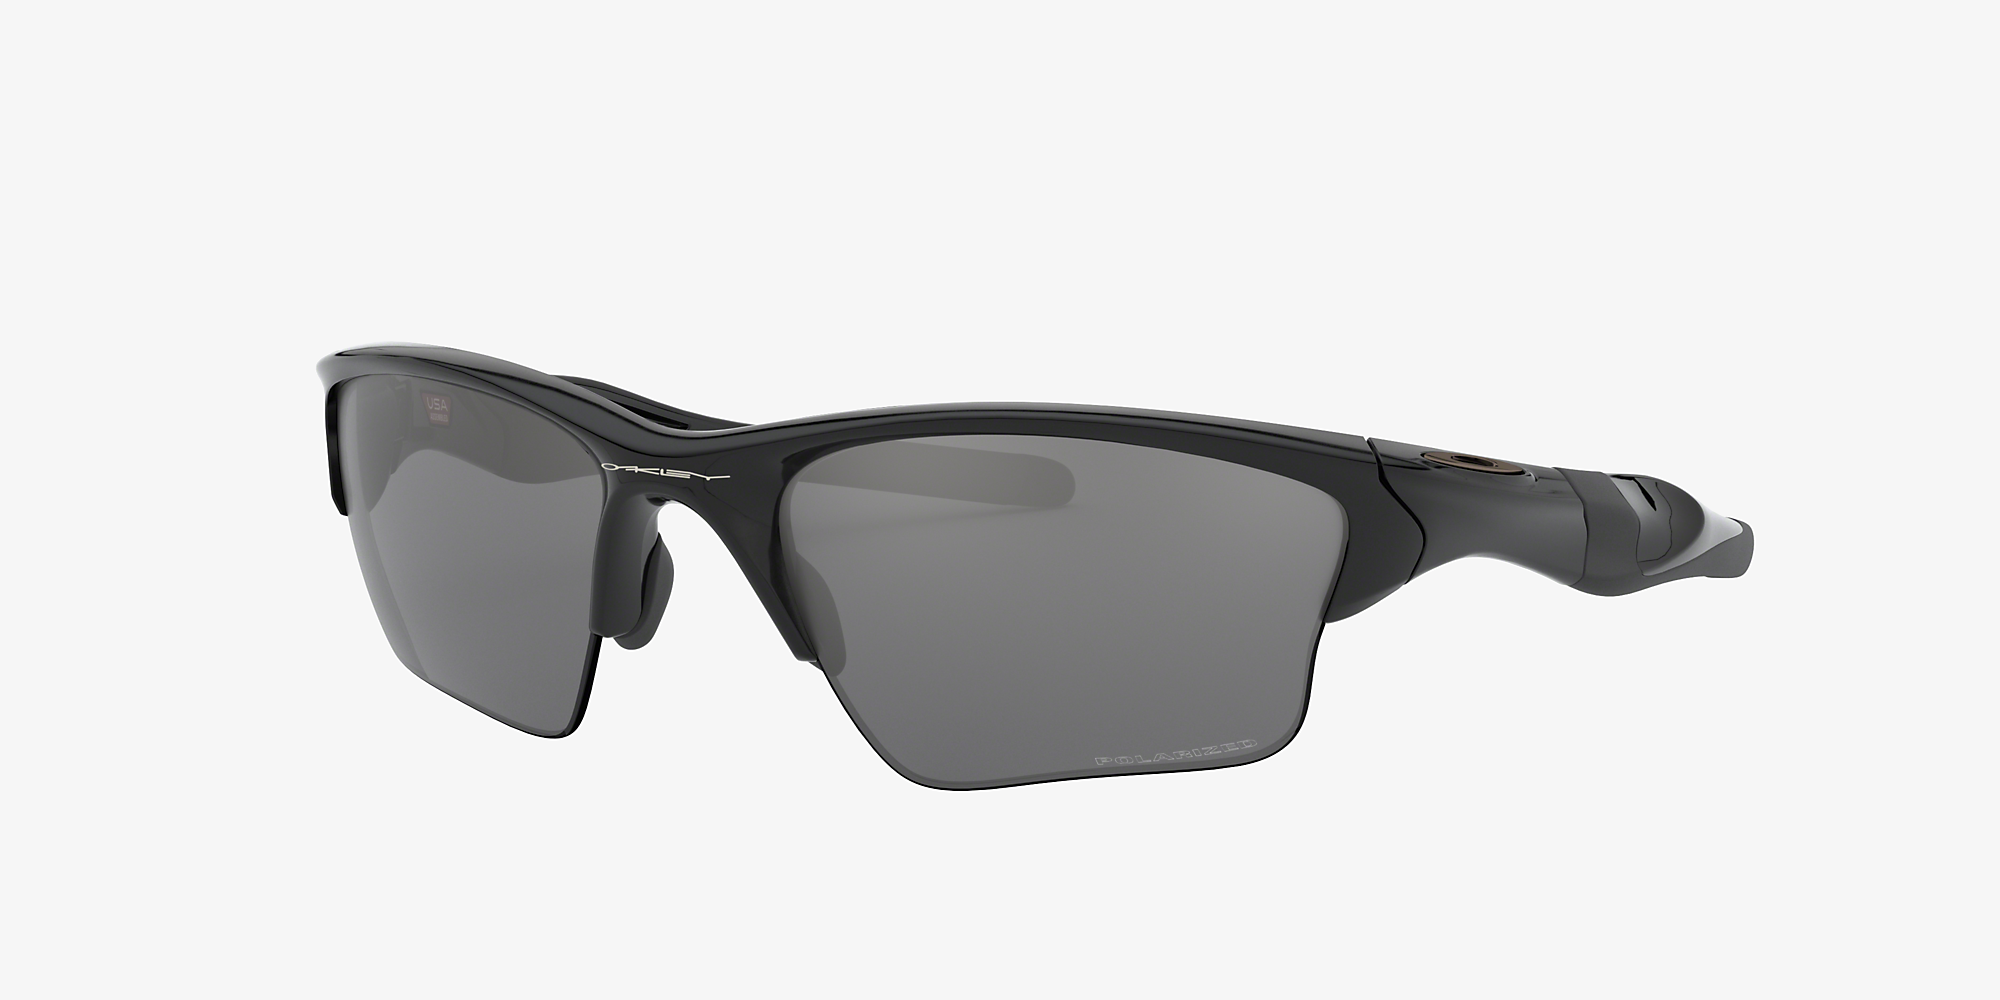 Oakley OO9154 Half Jacket® 2.0 XL Black/Grey /Polarized image 1